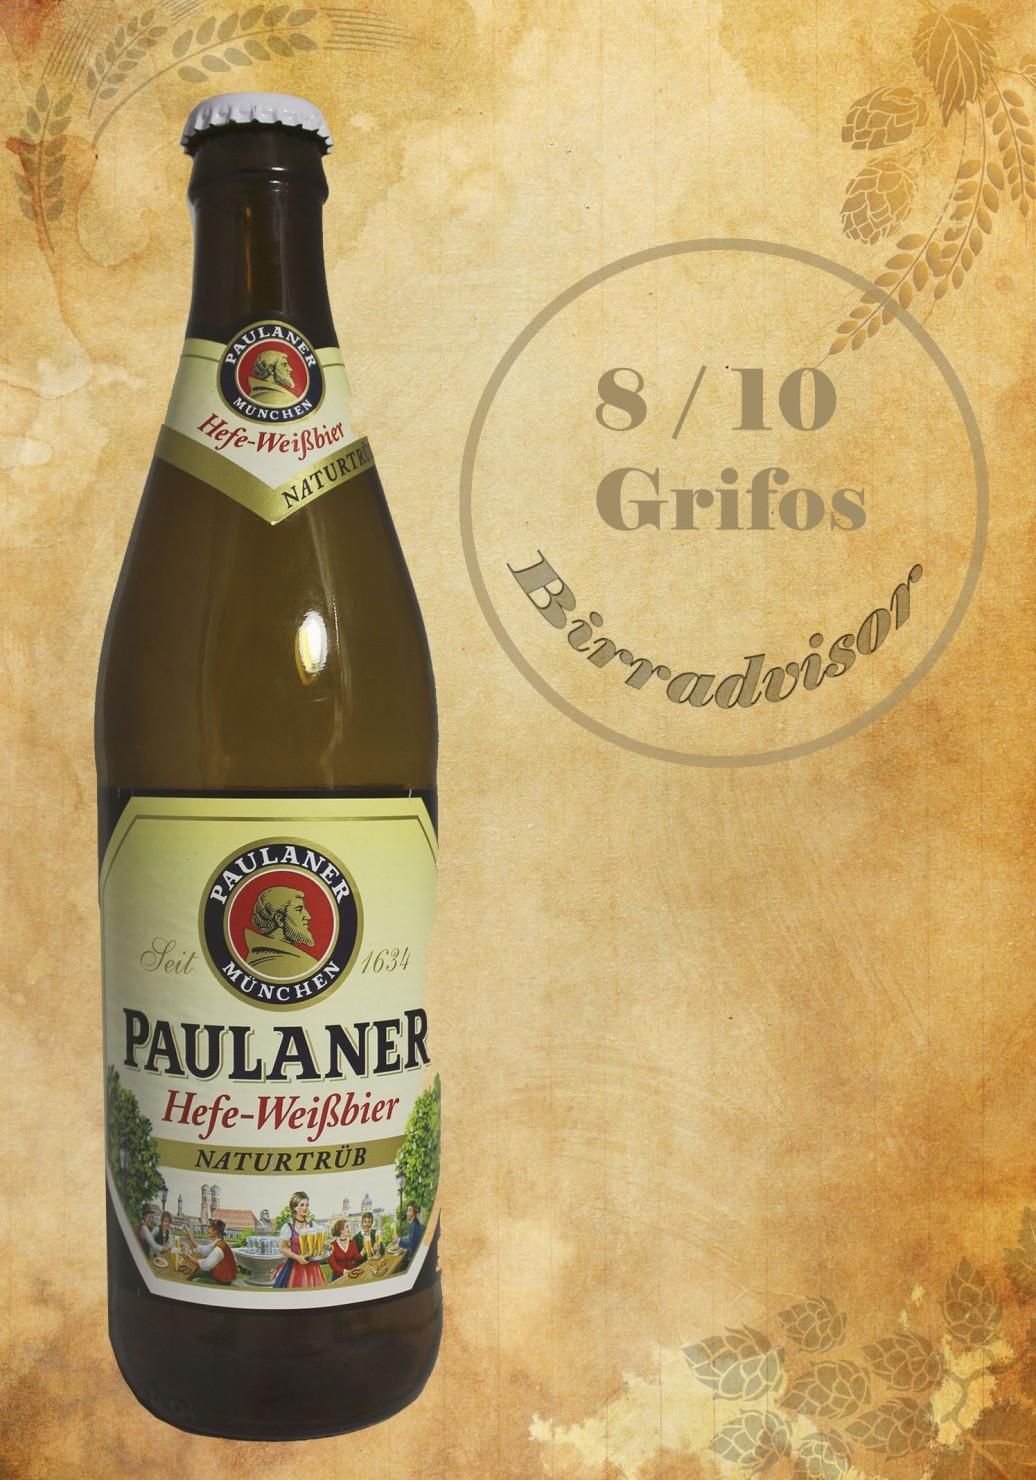 paulaner (hefe-weissbier)